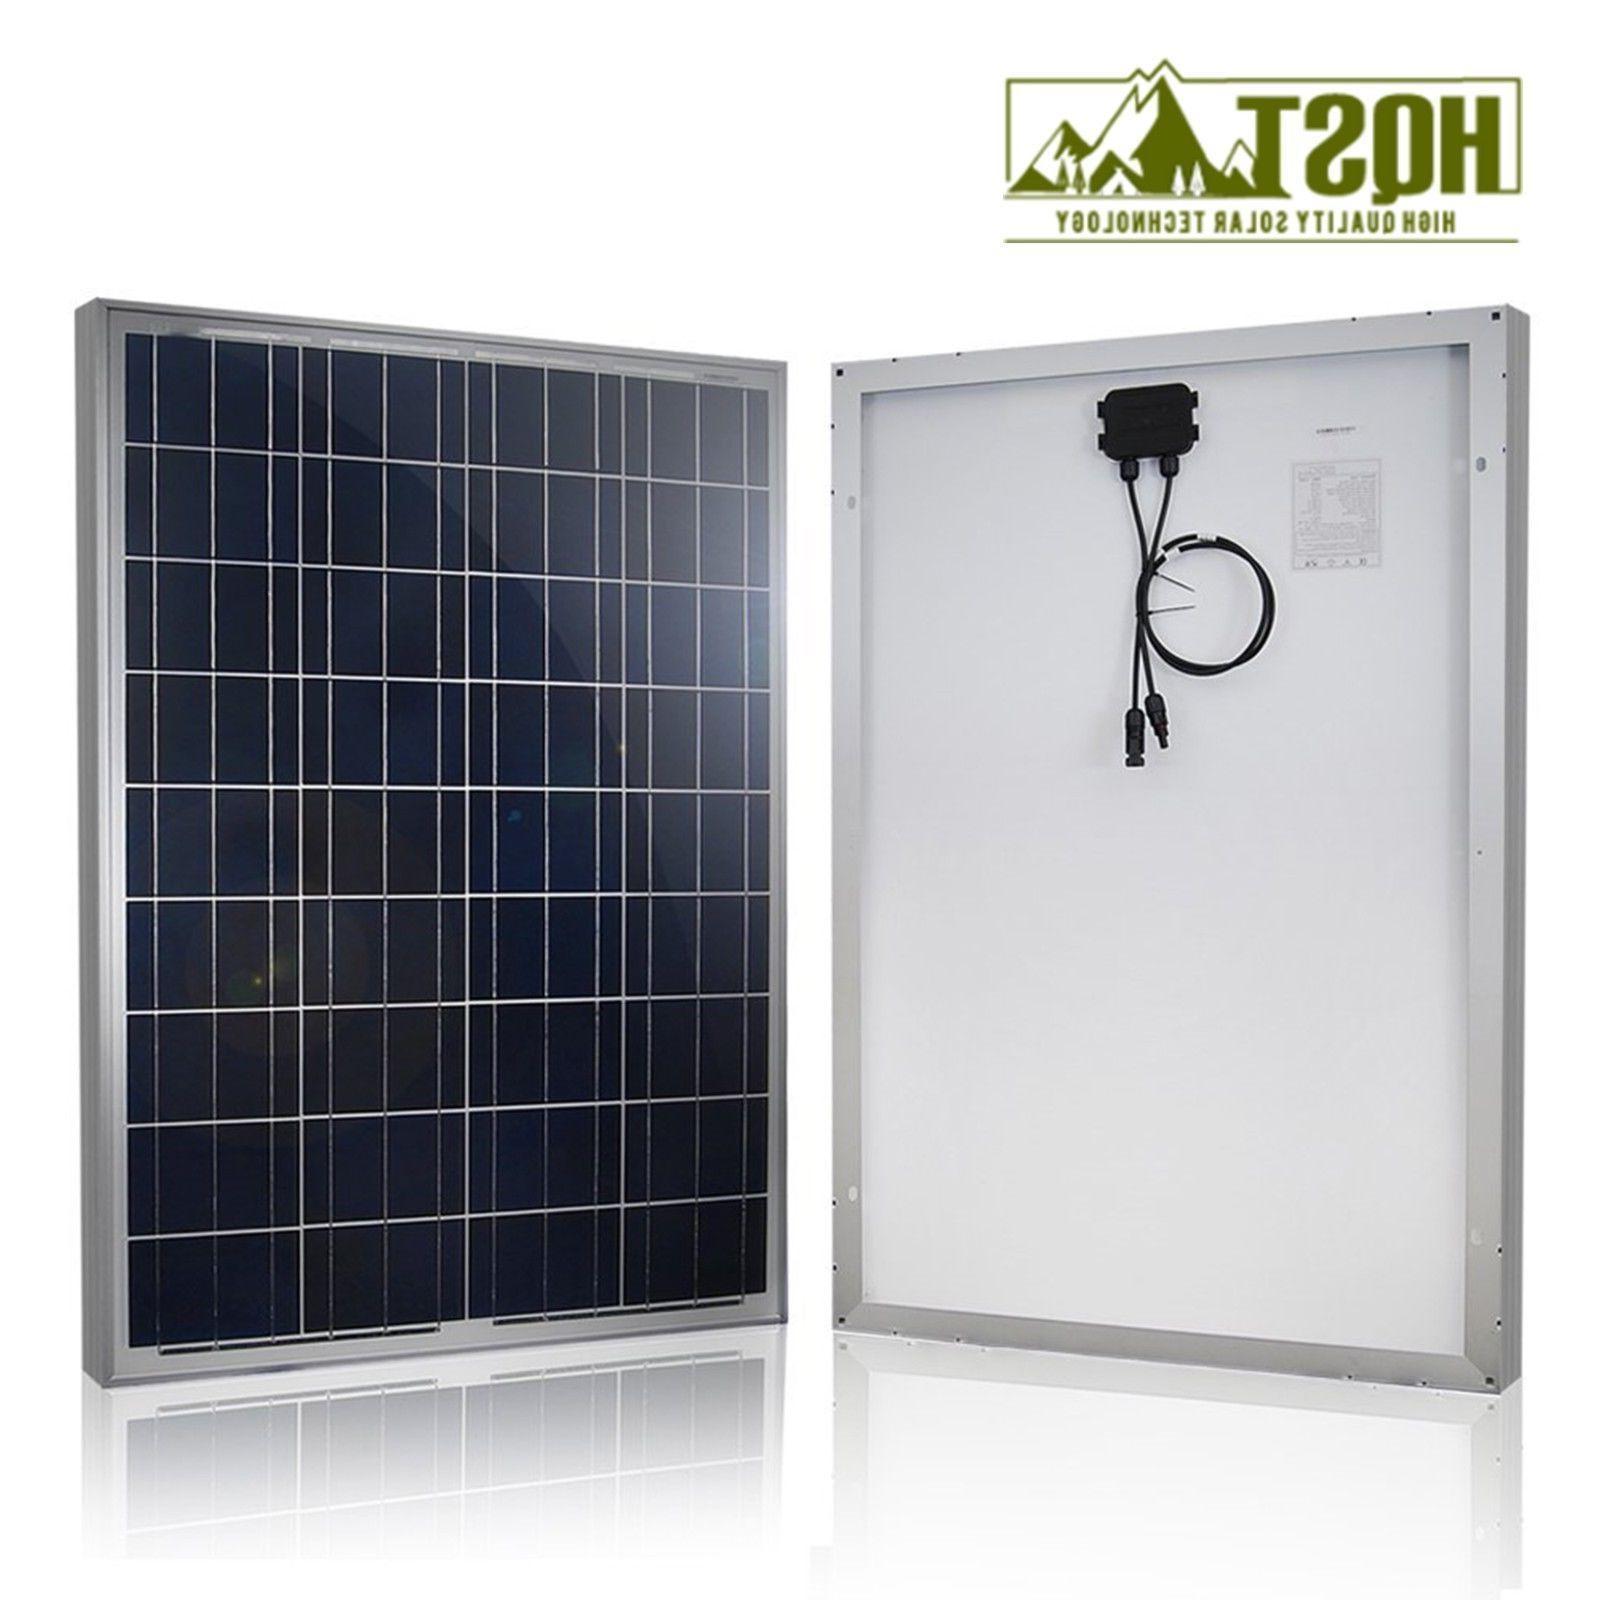 100 Watt 12 Volt Solar Kit Controller Charger Off Grid